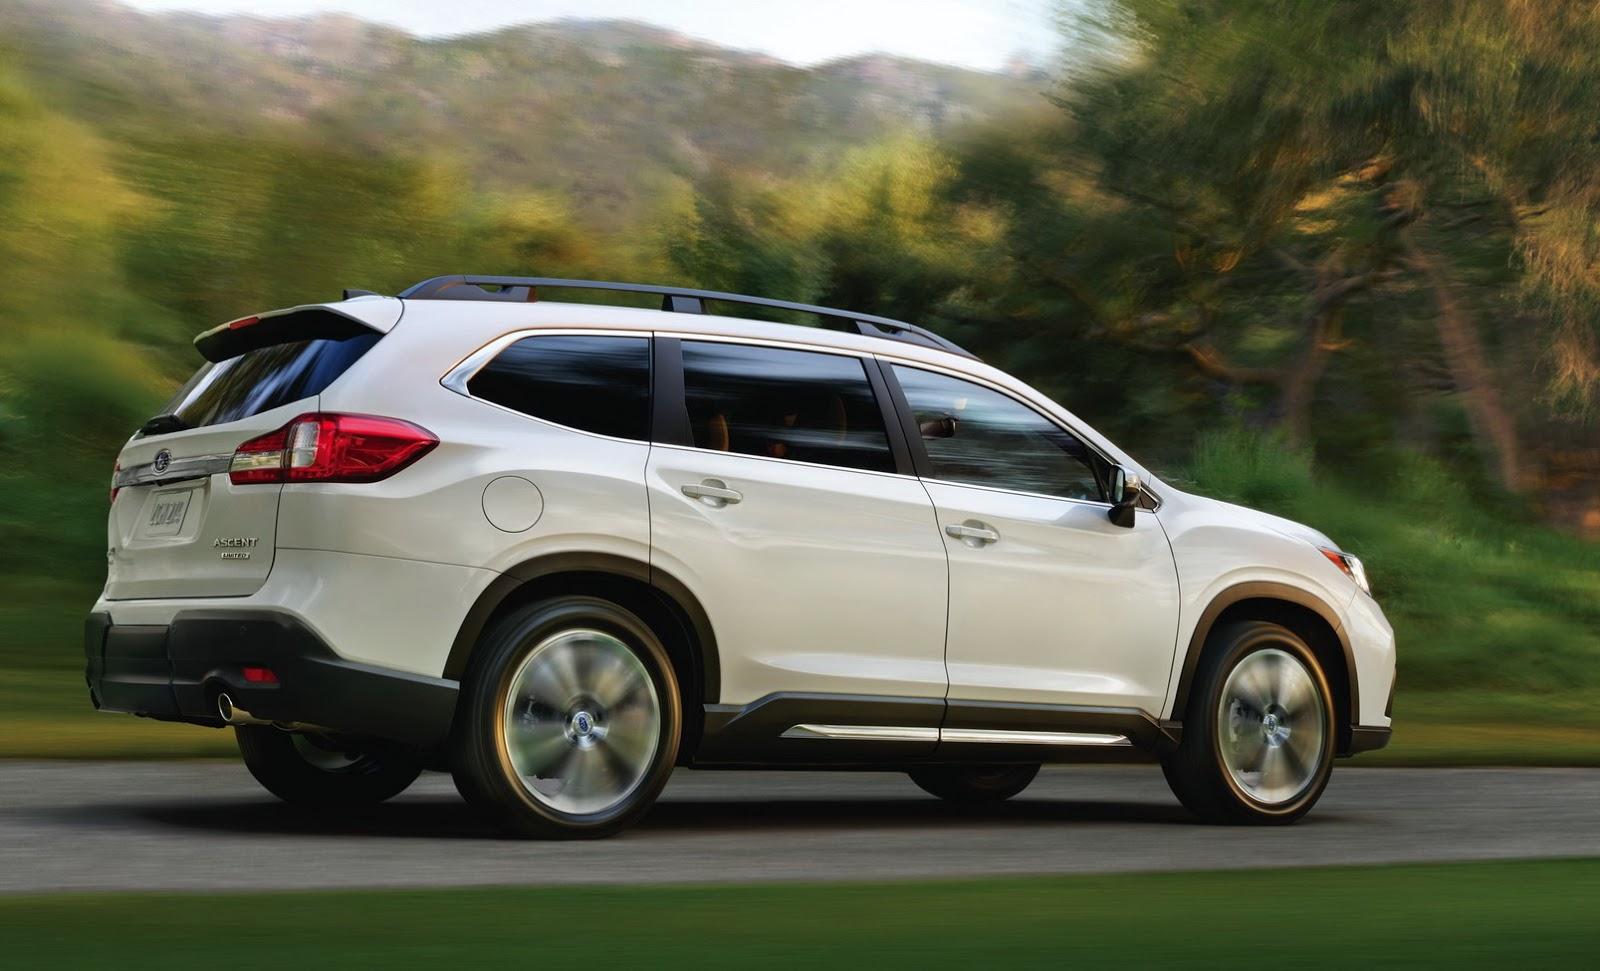 2019-Subaru-Ascent-7.jpg